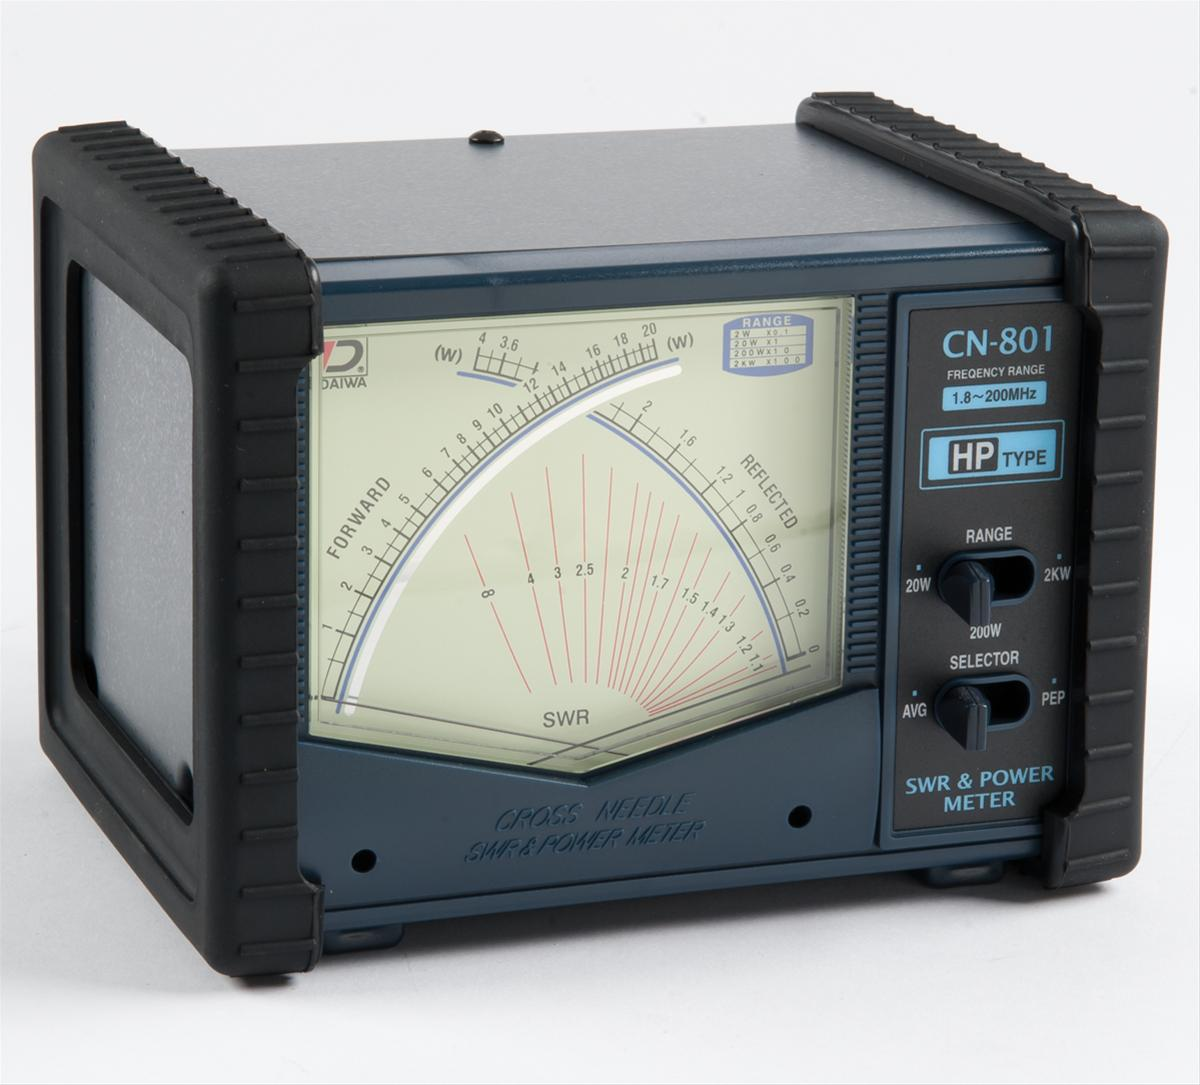 daiwa la 2080h service manual